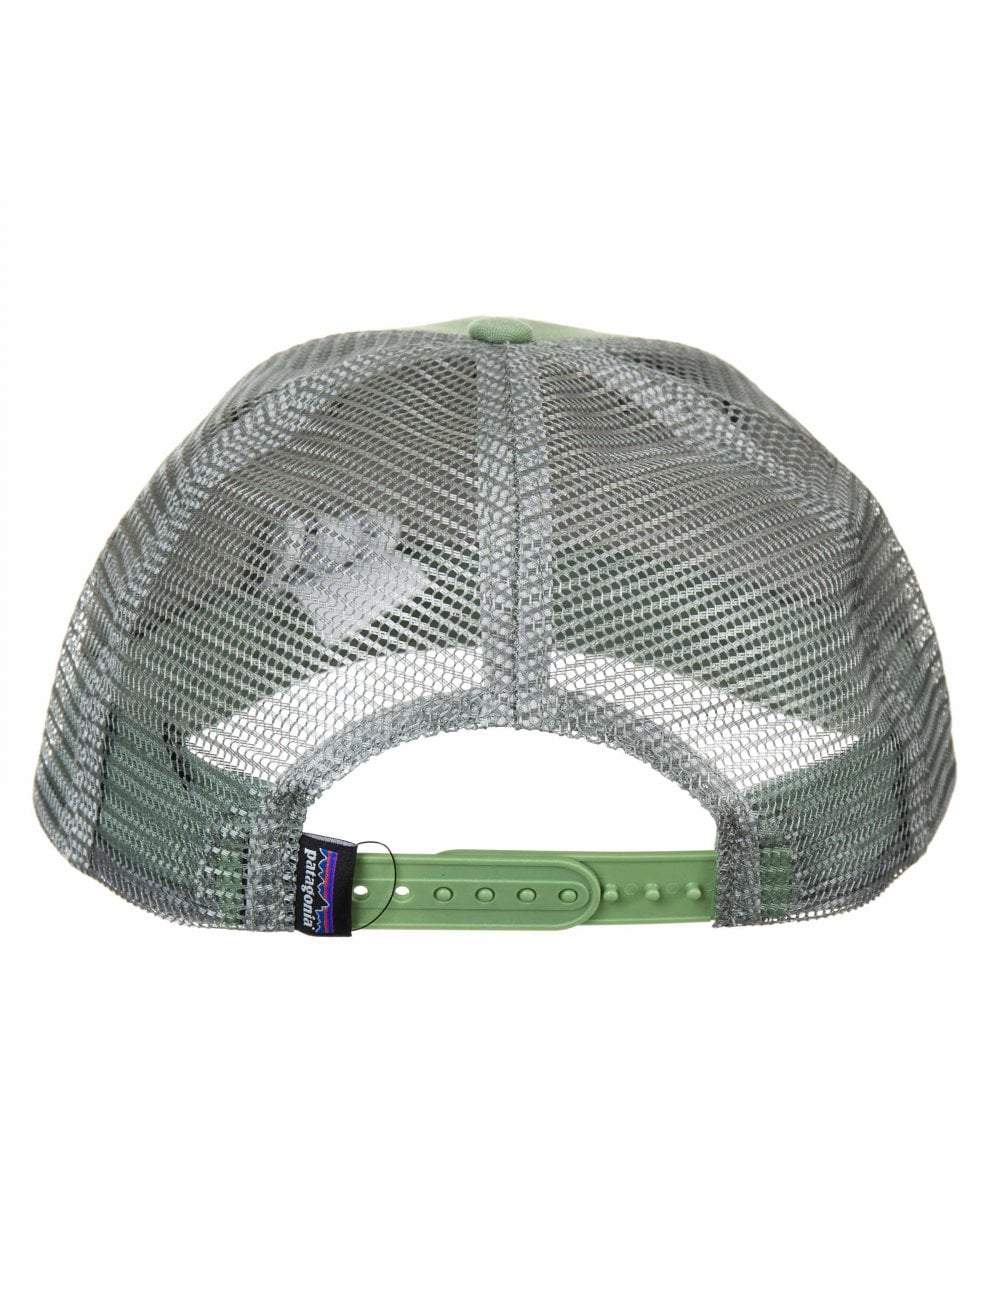 5f734f75b7e31 Patagonia Fitz Roy Trout Trucker Hat - Matcha Green - Accessories ...